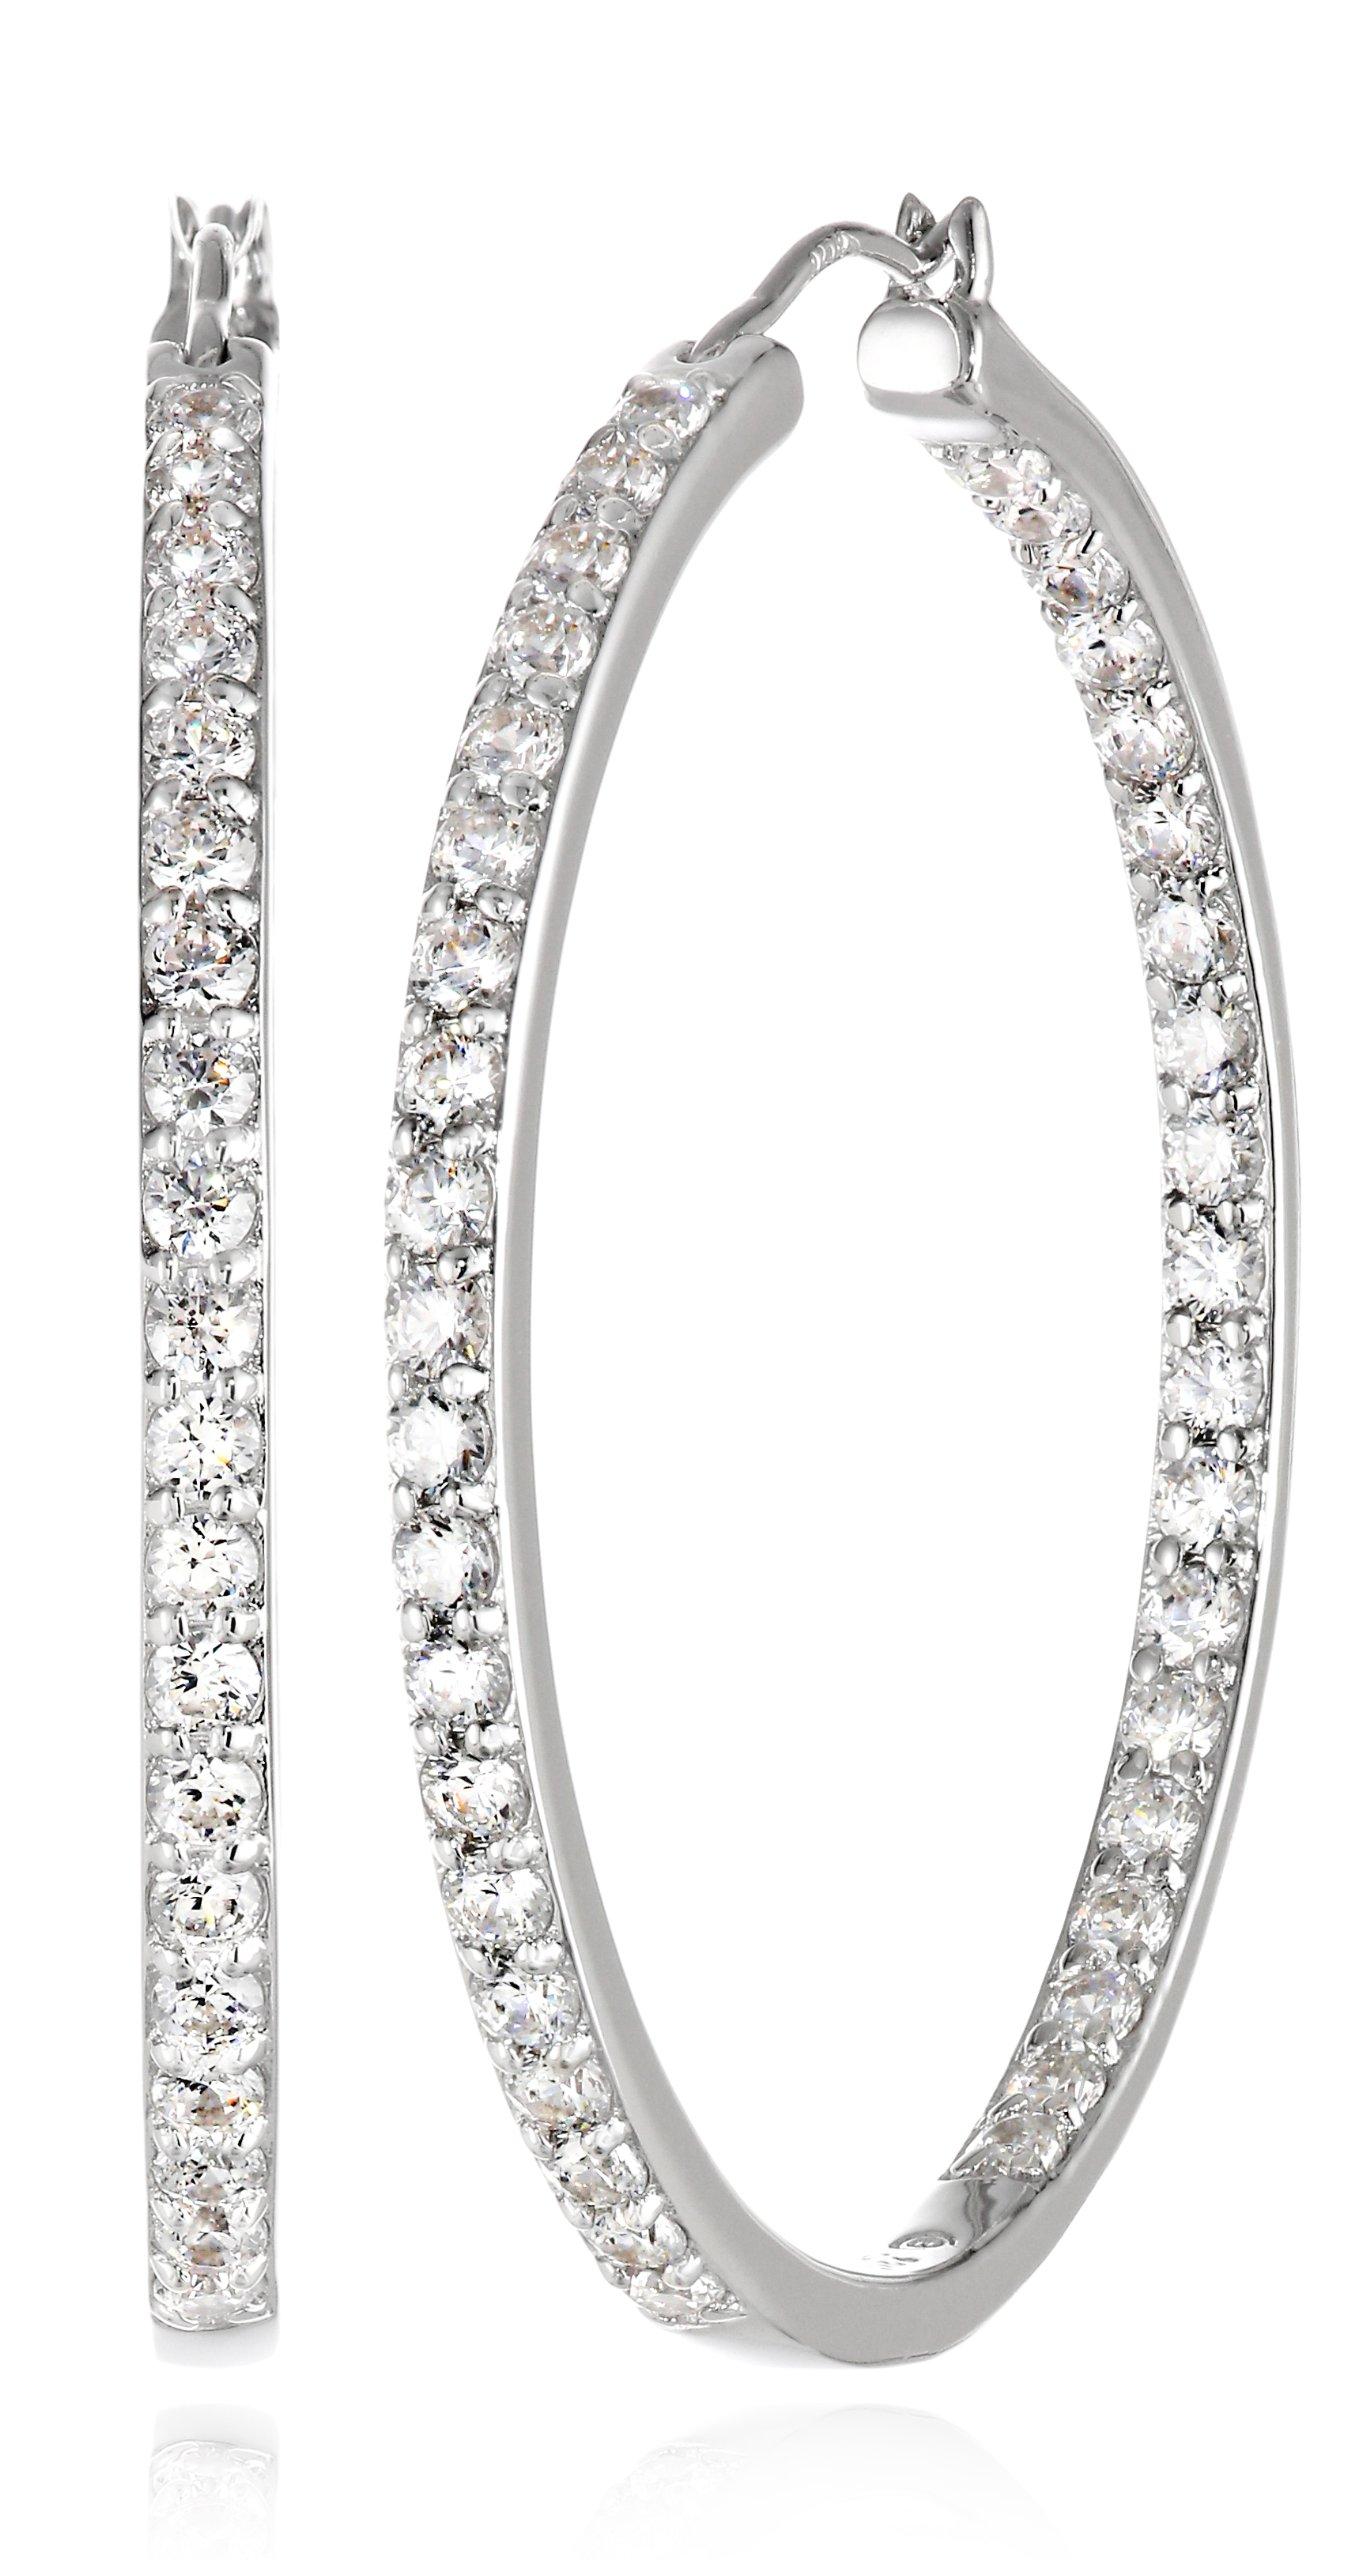 Platinum Plated Sterling Silver Hoop Earrings set with Round Cut Swarovski Zirconia (2.34 cttw), 1.5'' Diameter